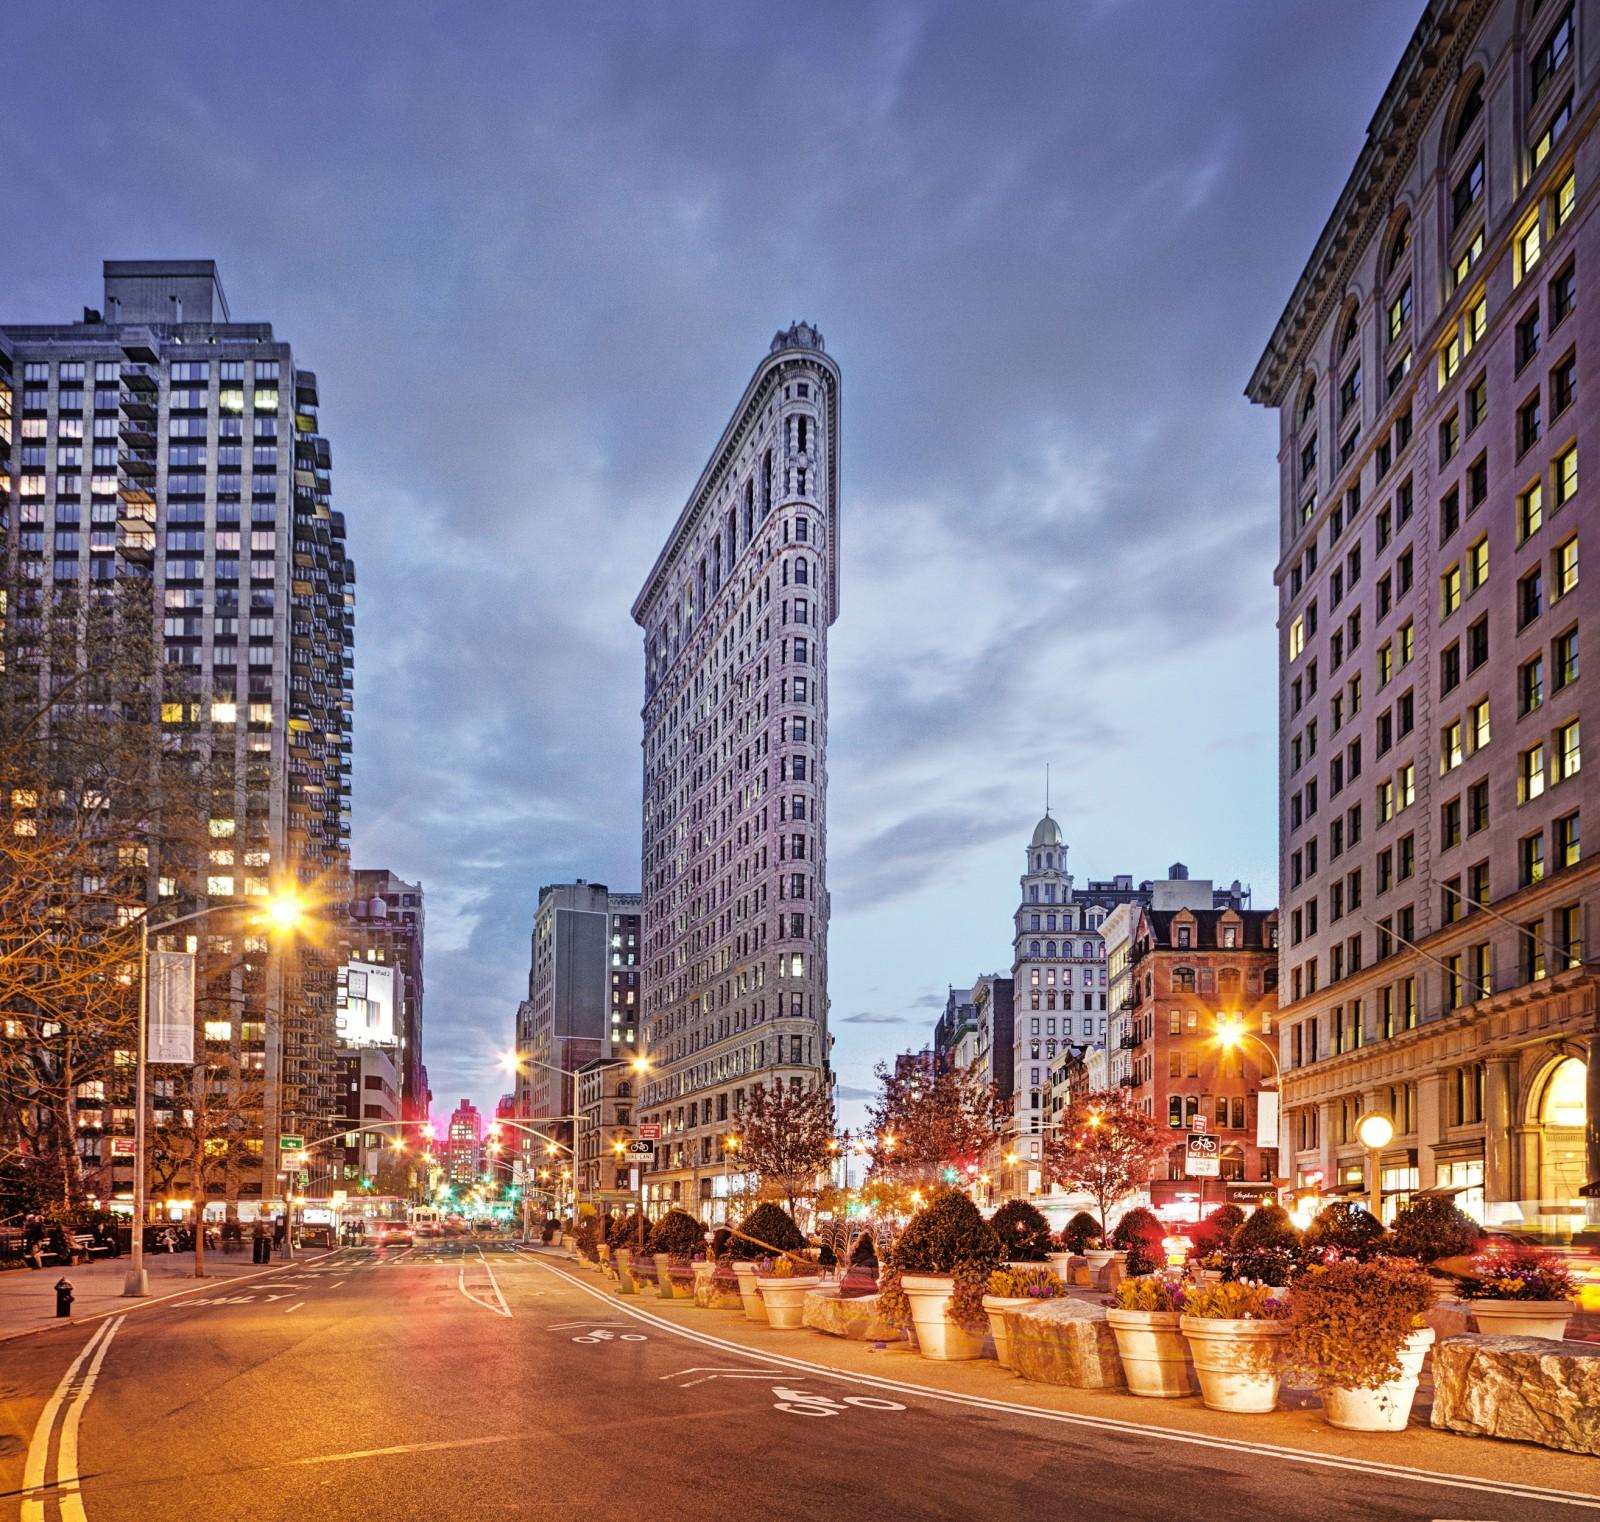 Hotel Giraffe New York City Nyc Subway Lines Parking Transport